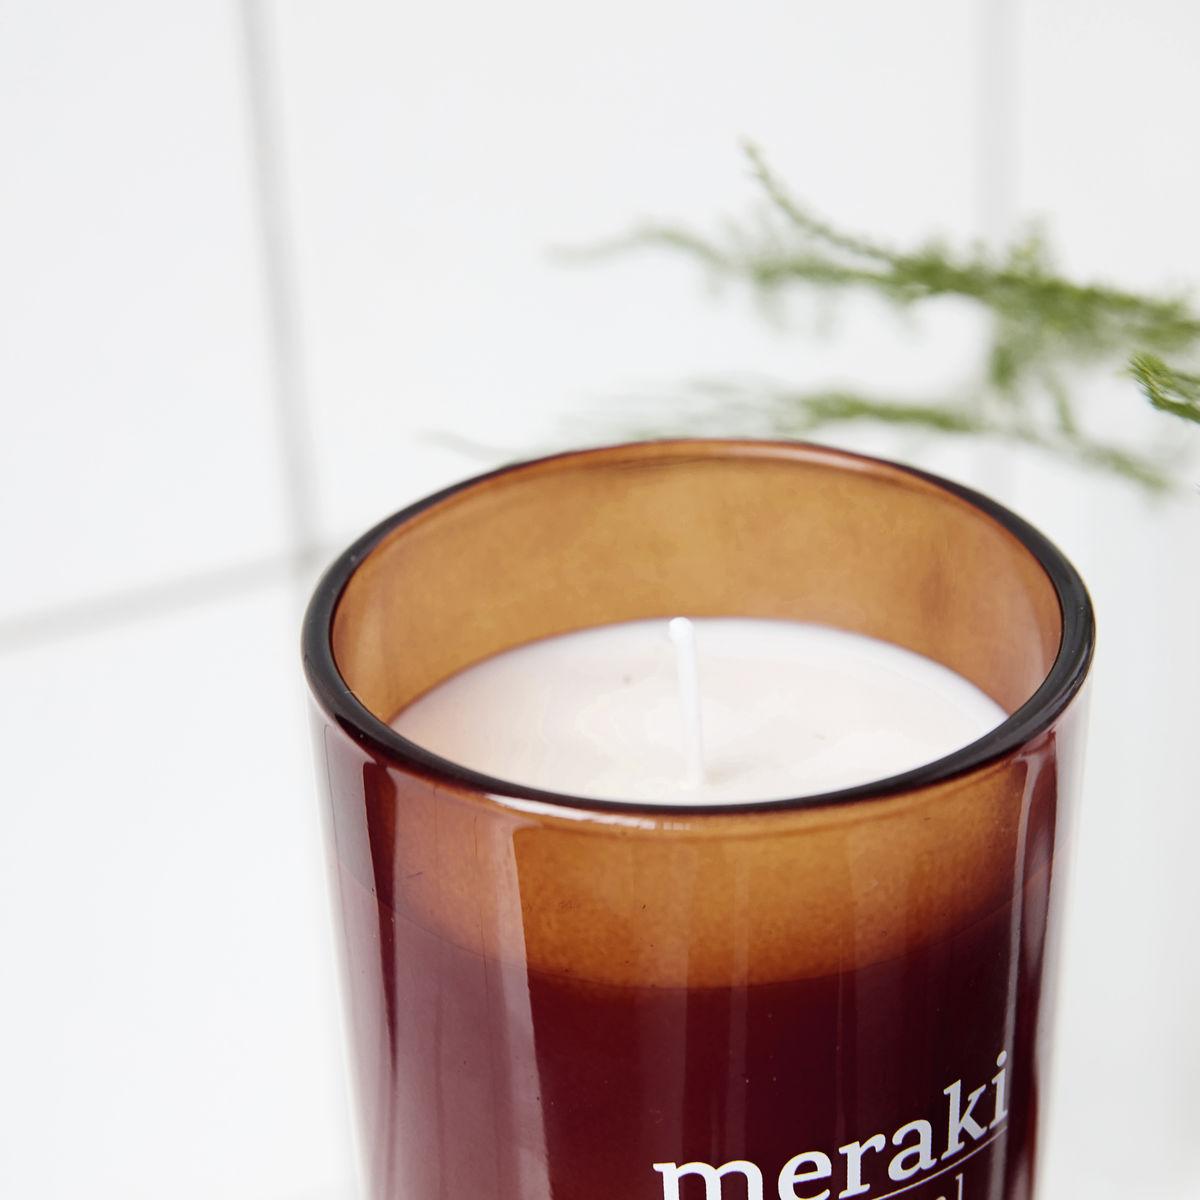 Meraki - Duftlys Stor - Scandinavian Garden 2